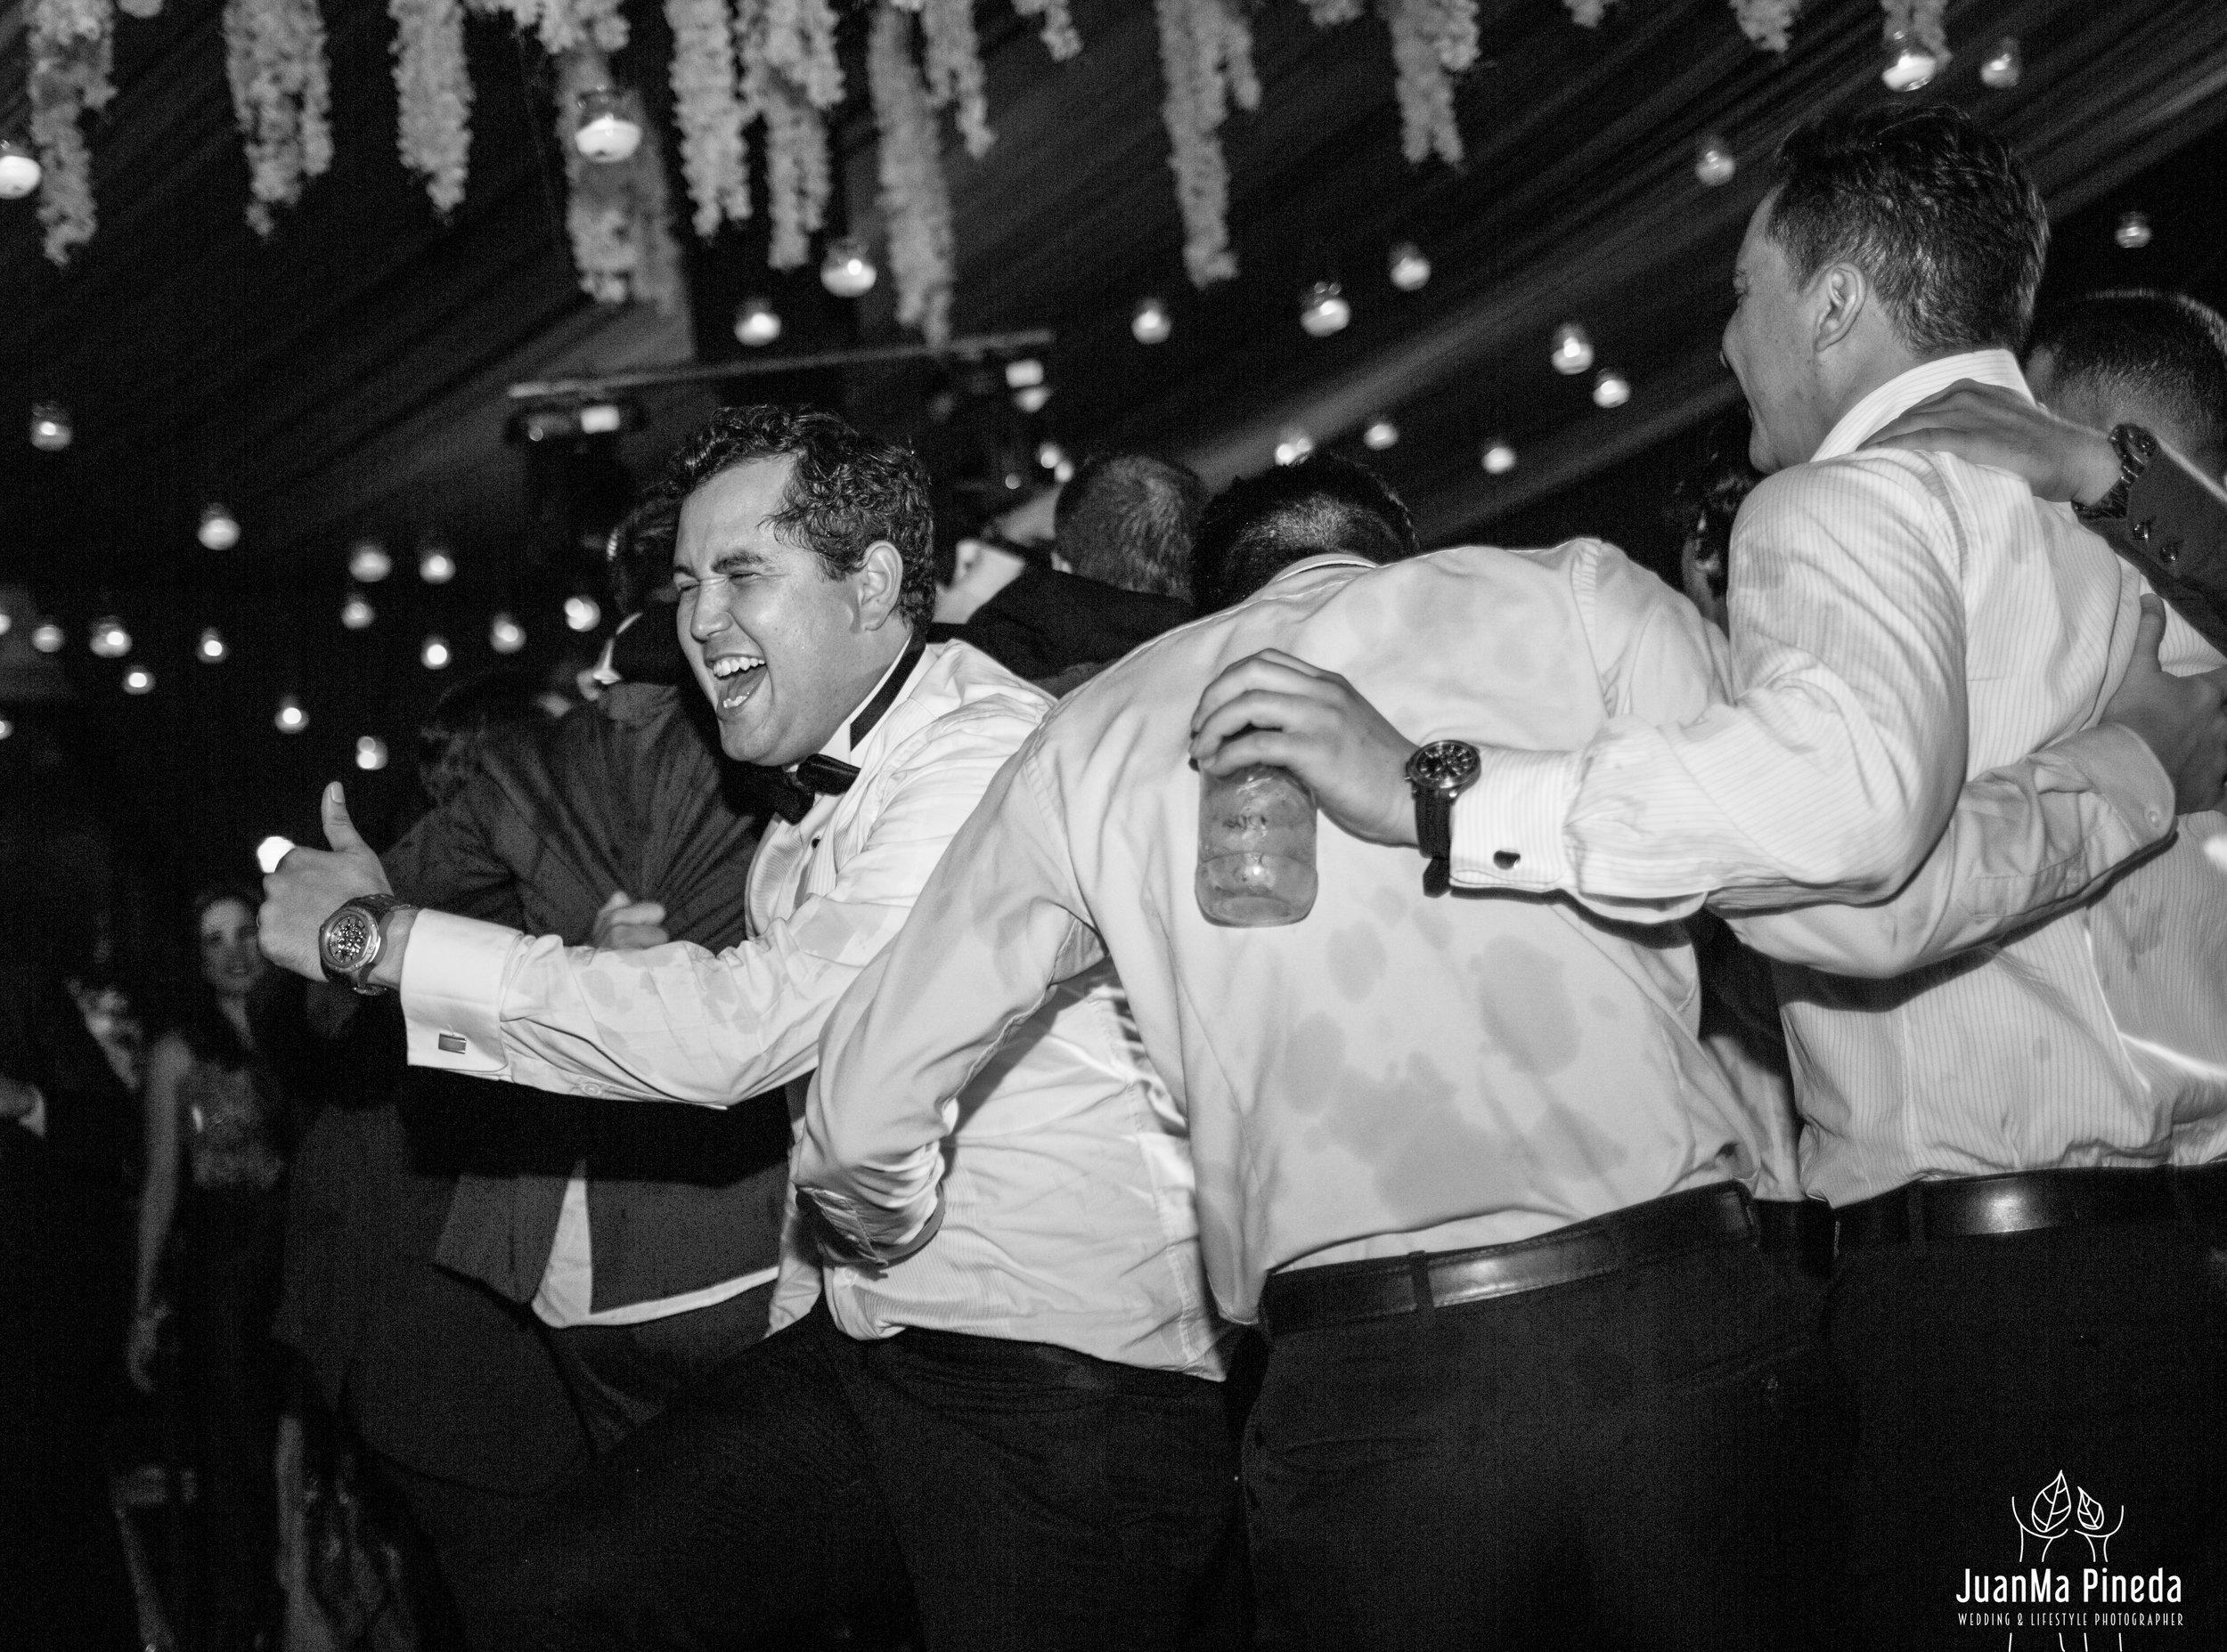 Wedding+Day+Photographer-1-20.jpg